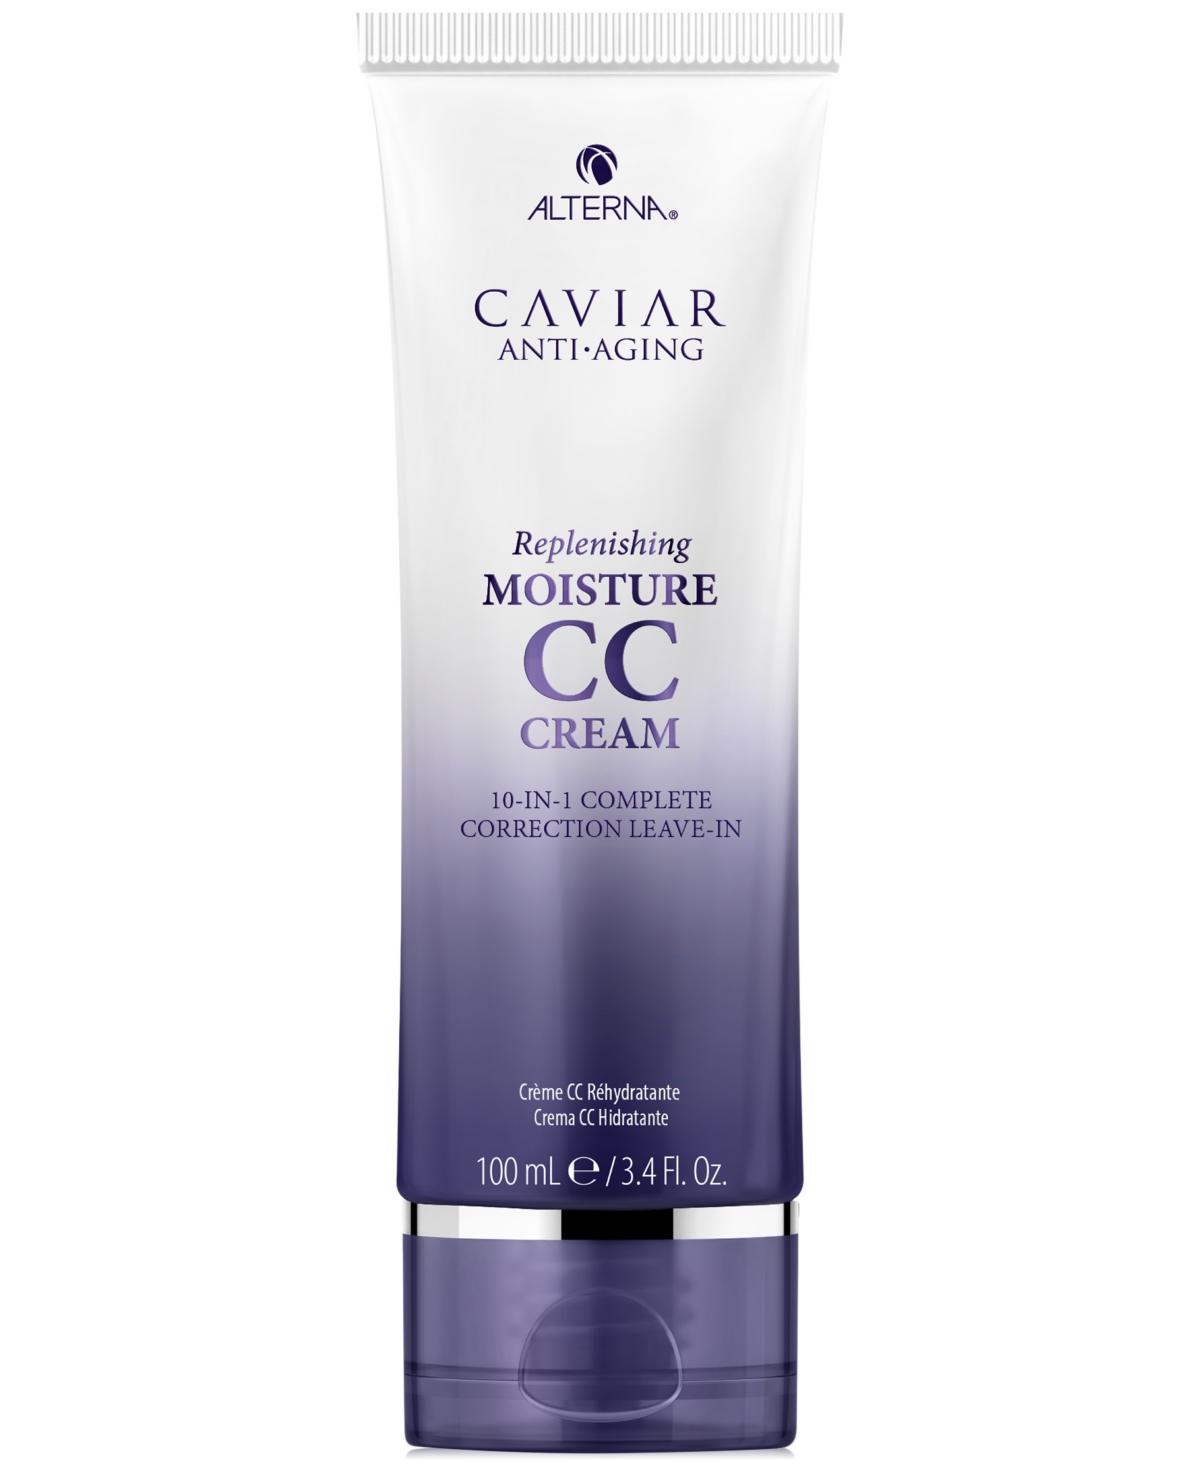 Alterna Caviar Anti-Aging Replenishing Moisture Cc Cream, 3.4-oz.